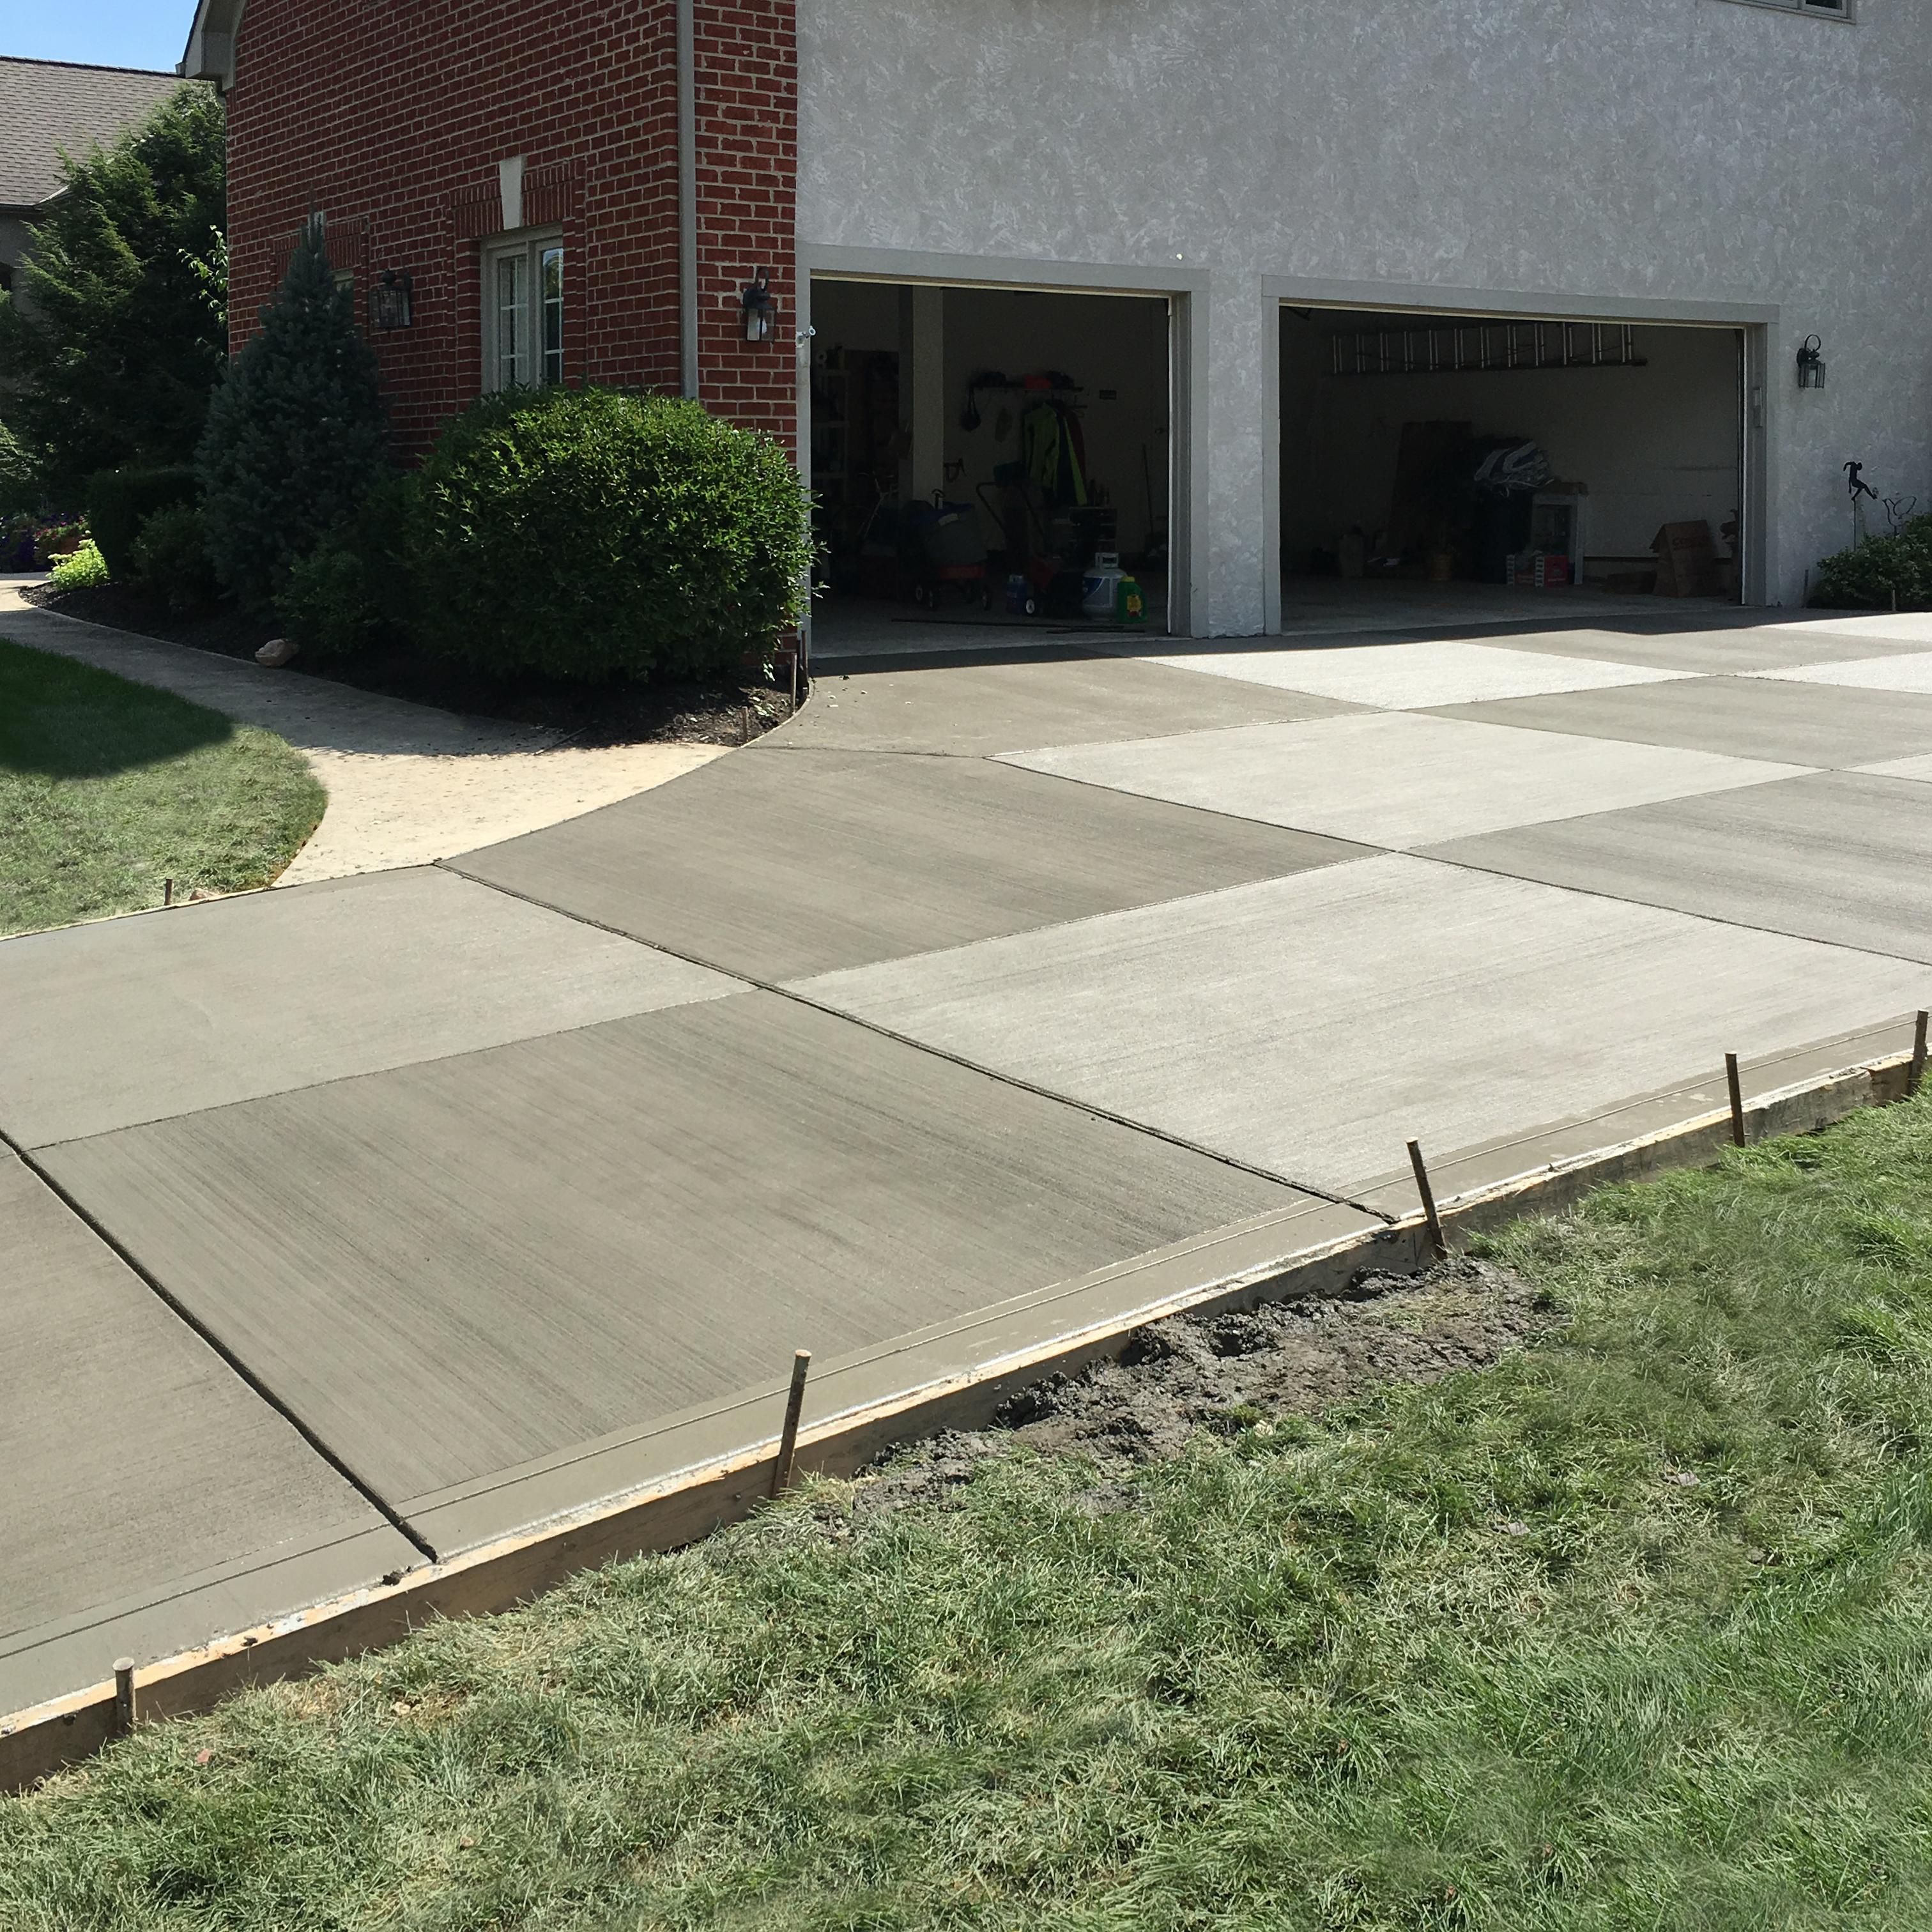 Concrete Driveway in Columbus